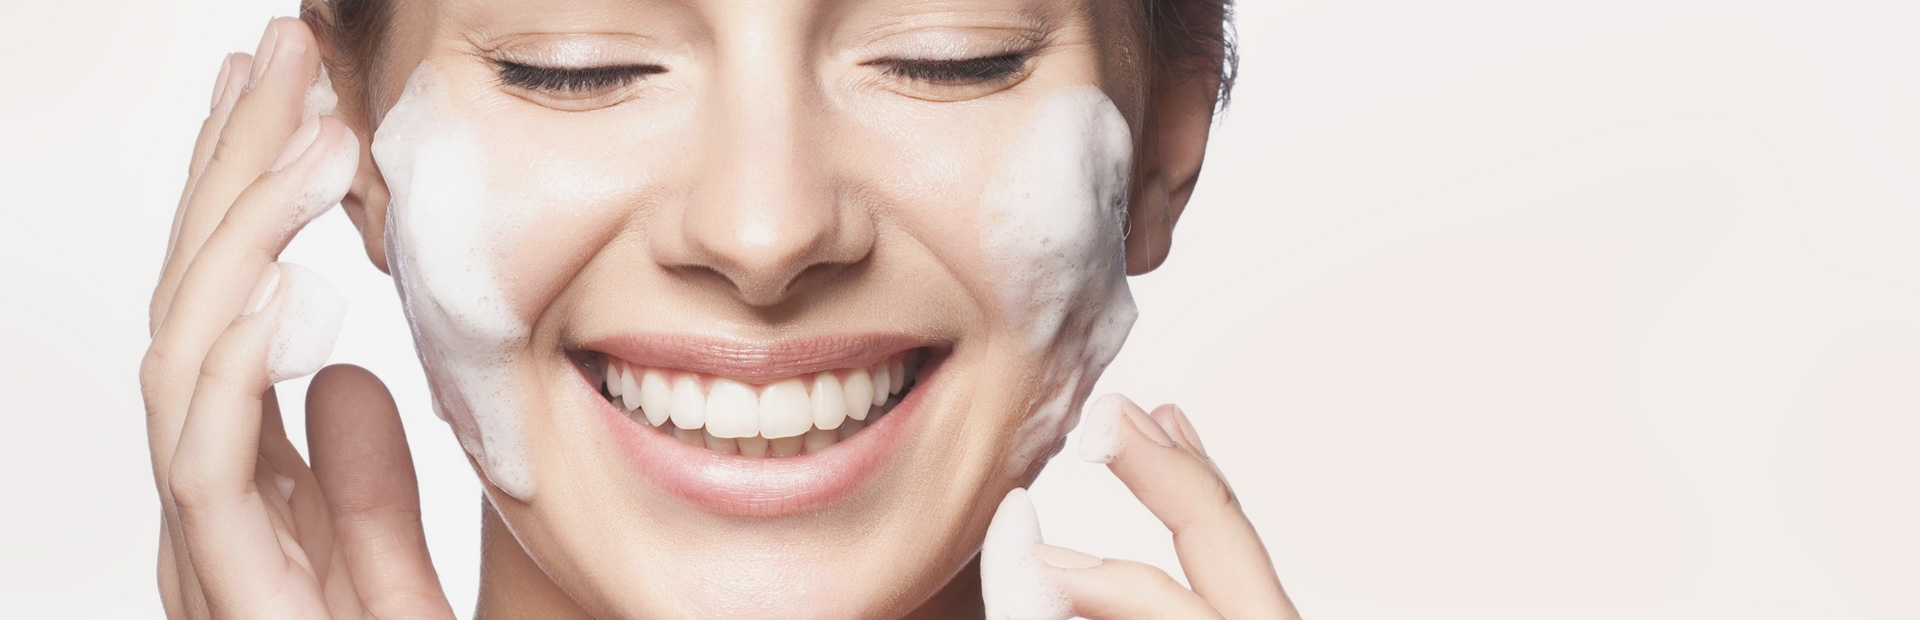 Rimpler Cosmetics